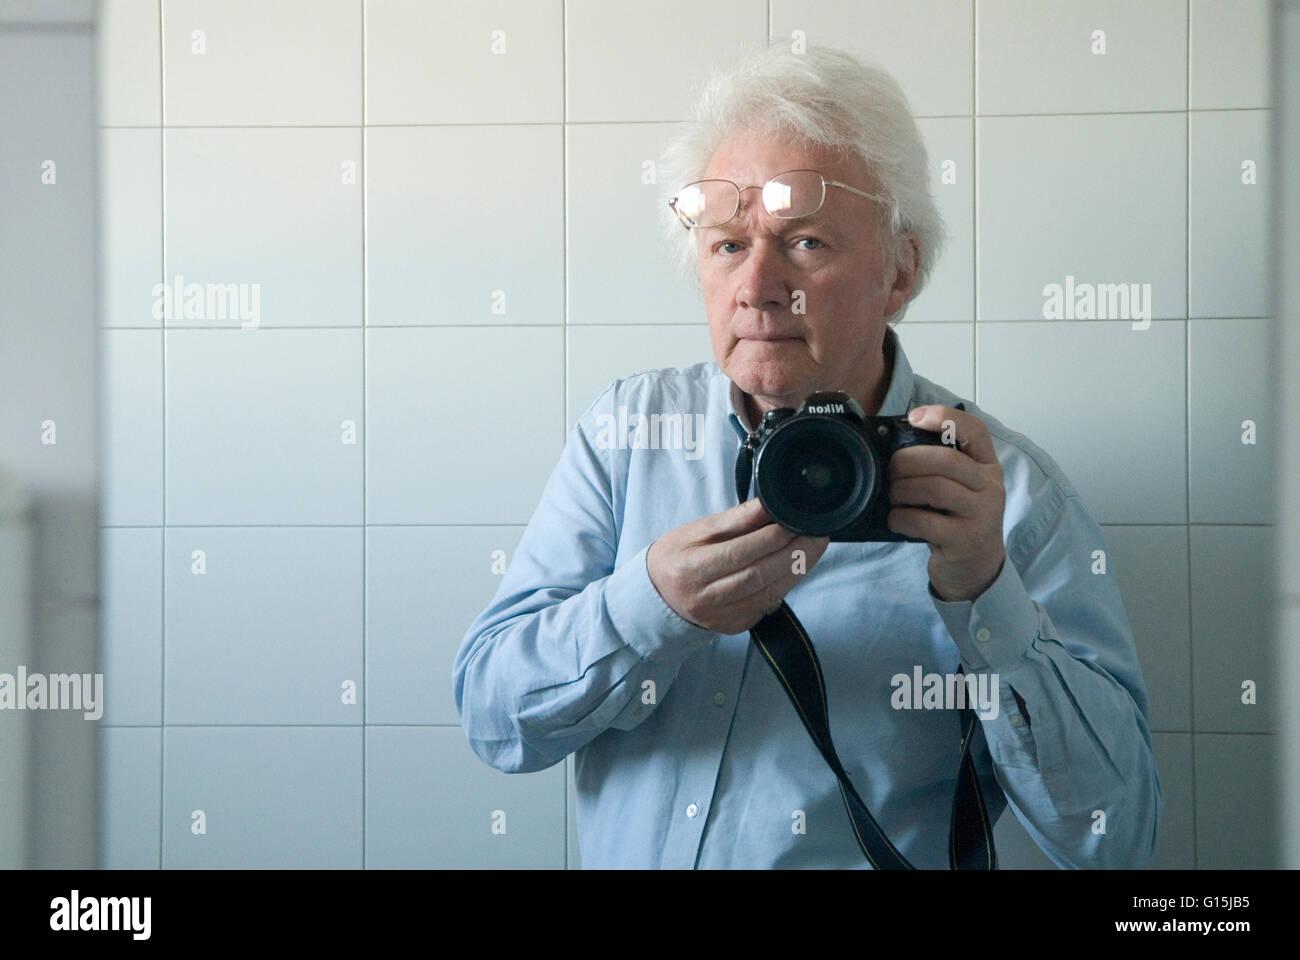 Homer Sykes fotógrafo 2016 autorretrato Imagen De Stock